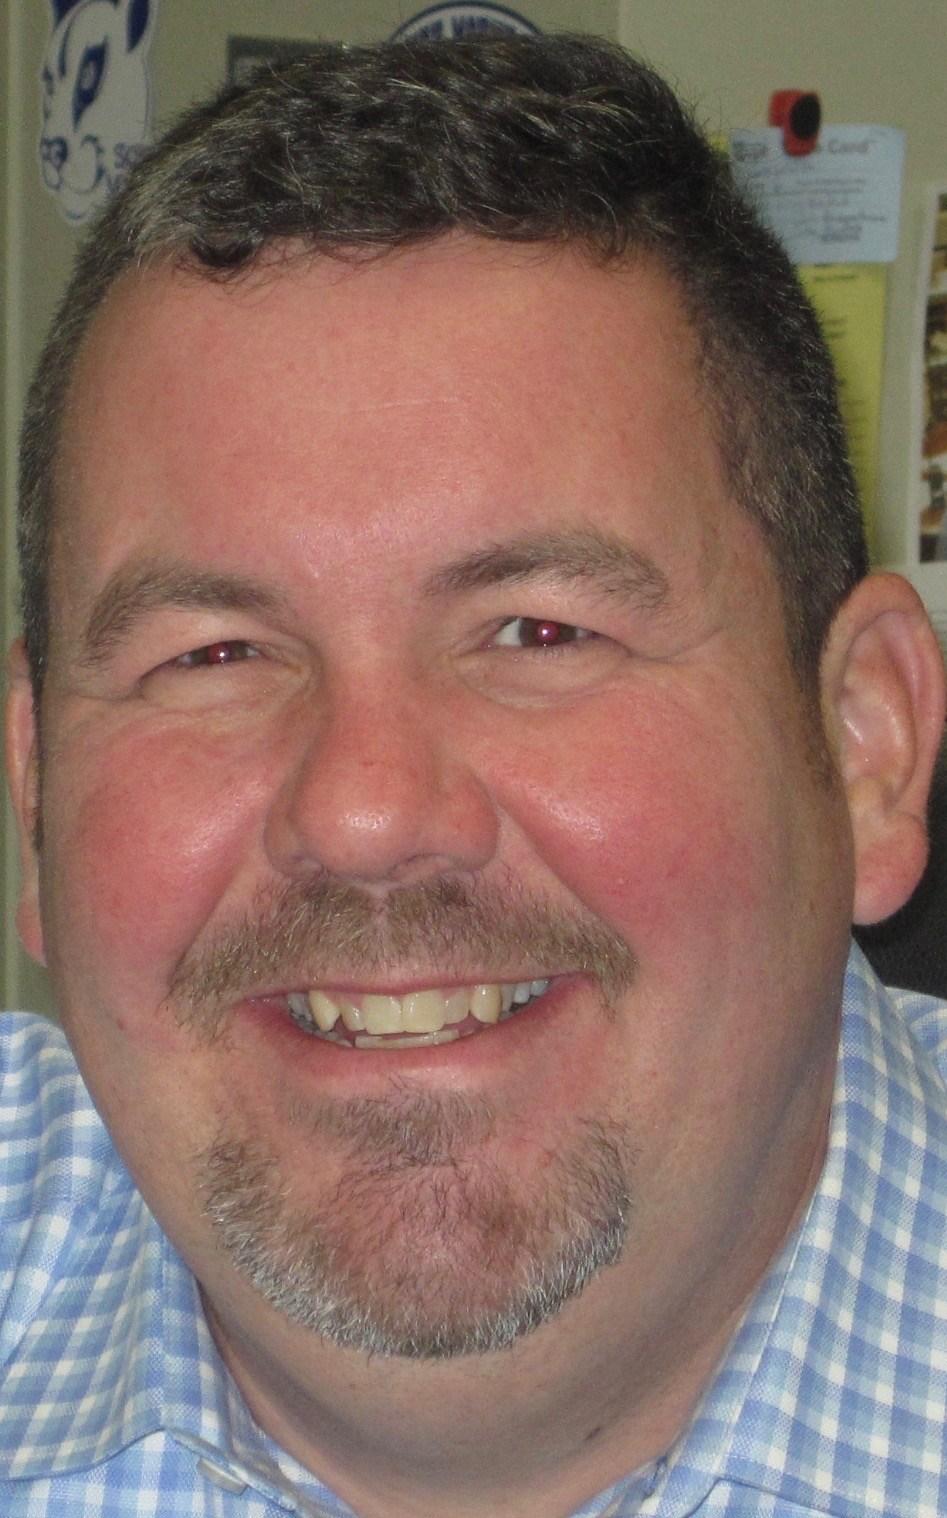 Mr. Wolfe, Principal